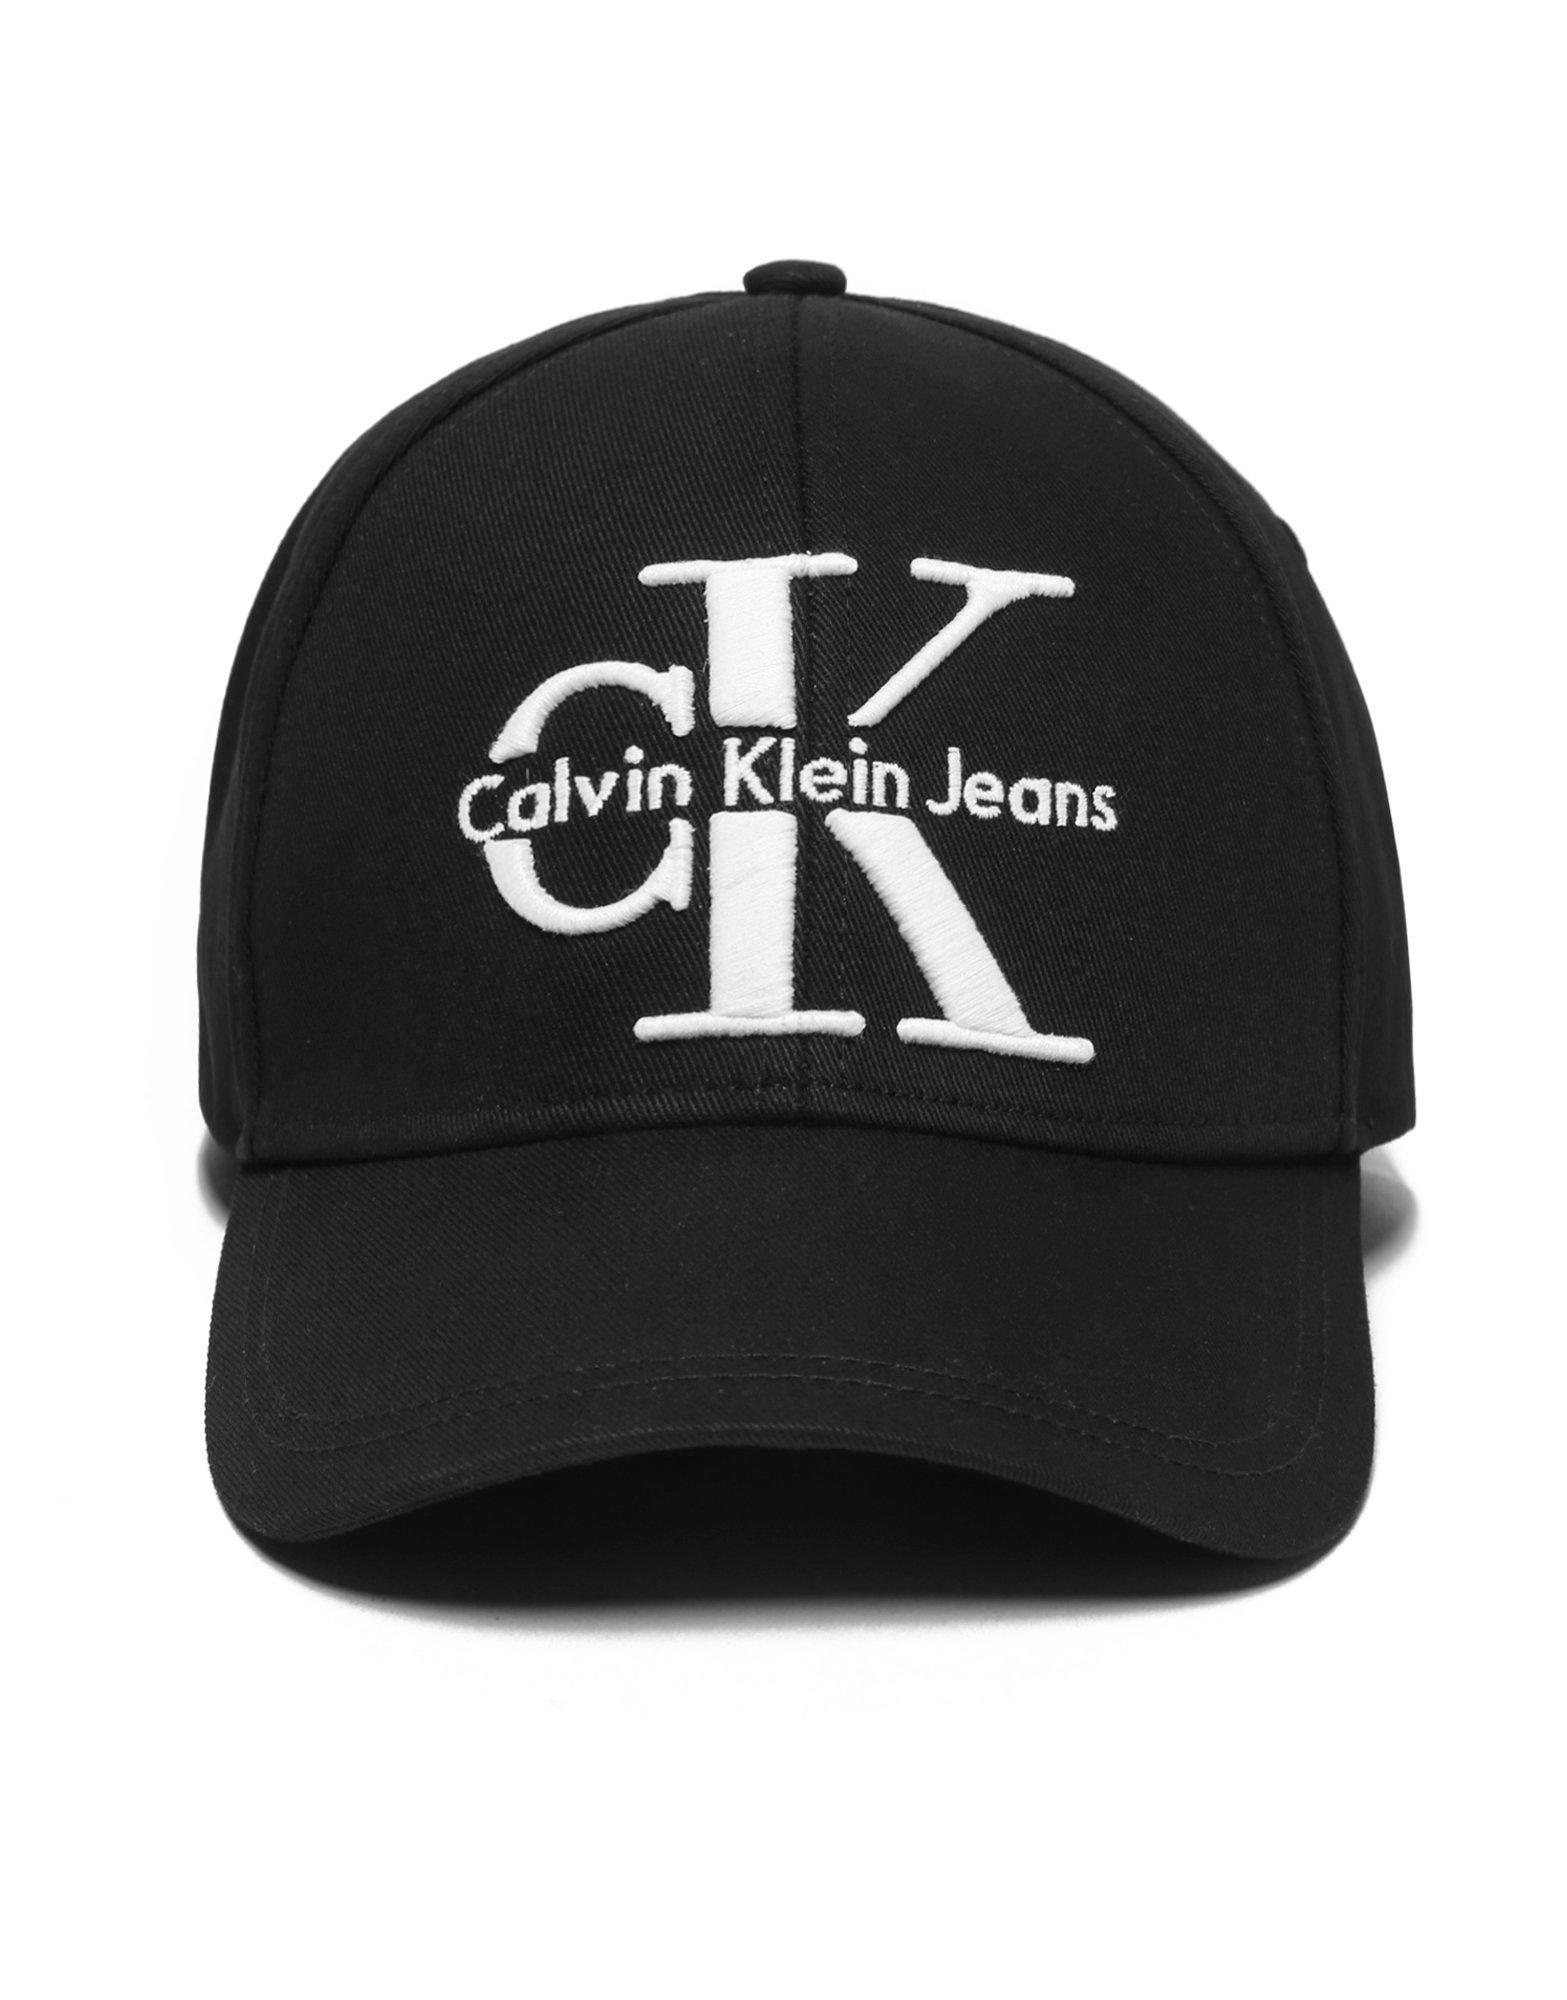 b9f4525d CALVIN KLEIN 205W39NYC Jeans Reissue Cap in Black for Men - Lyst